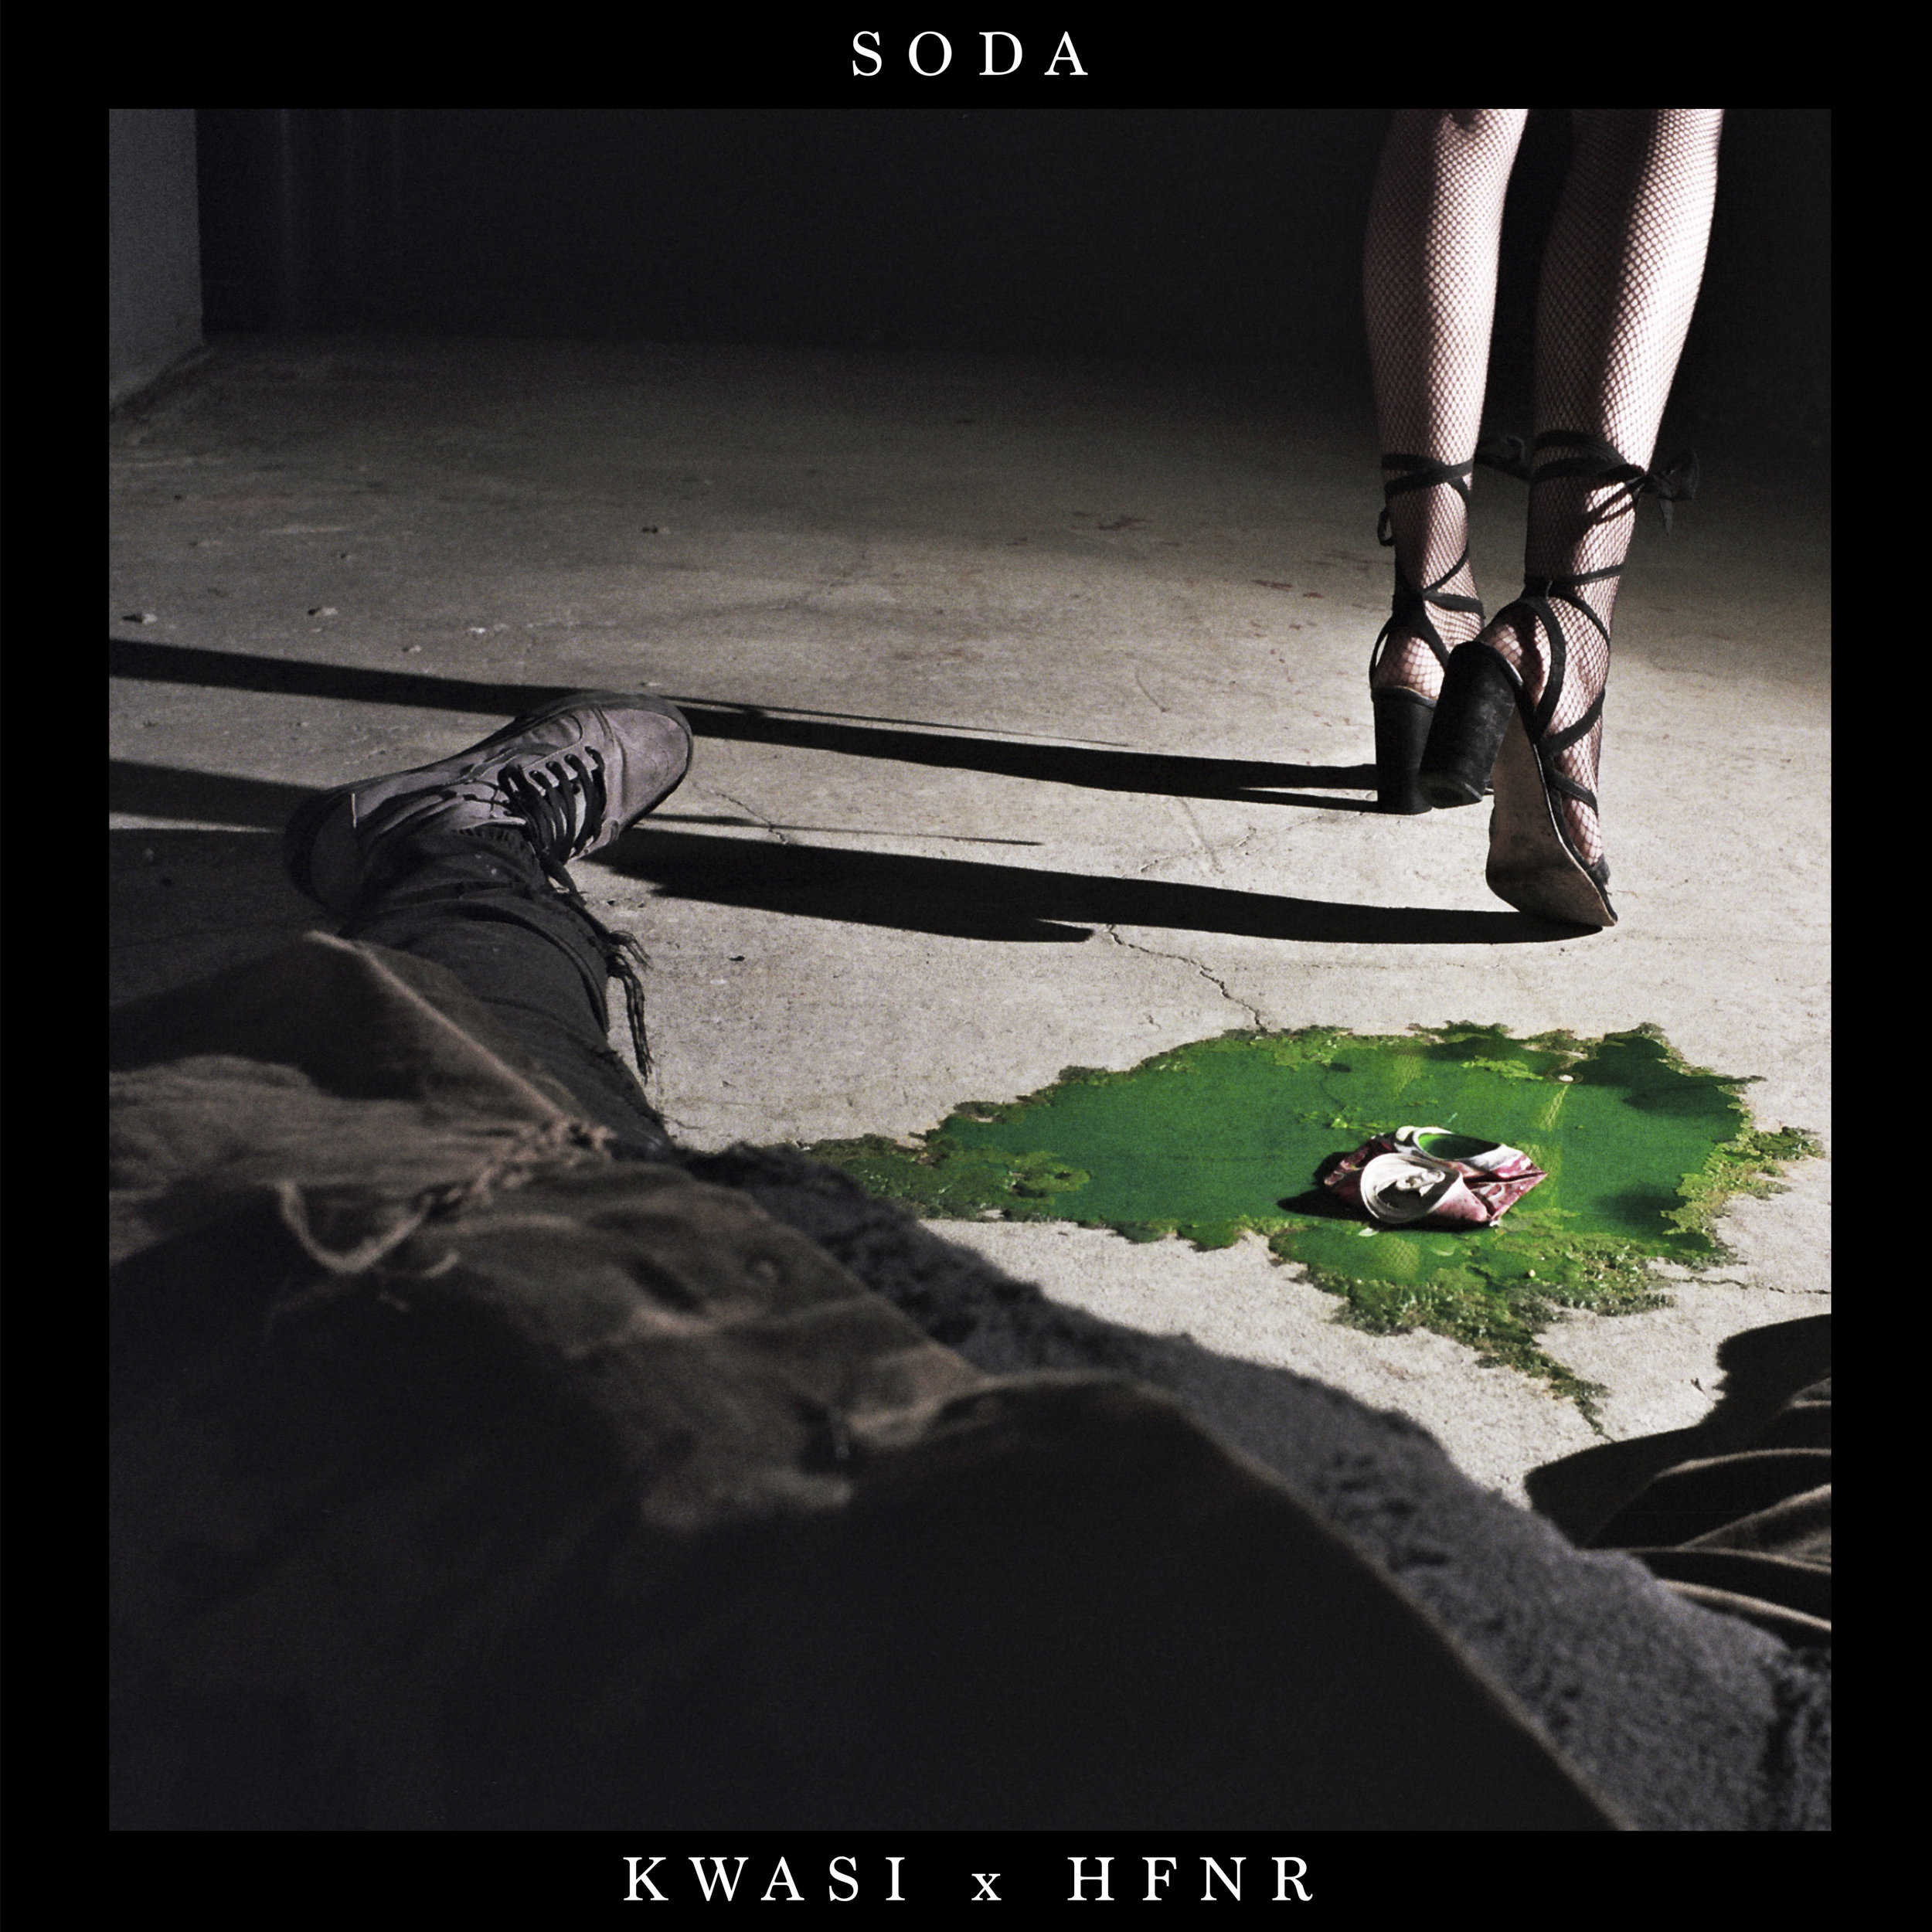 WVS015 - Kwasi x HFNR - Soda - Artwork.jpg